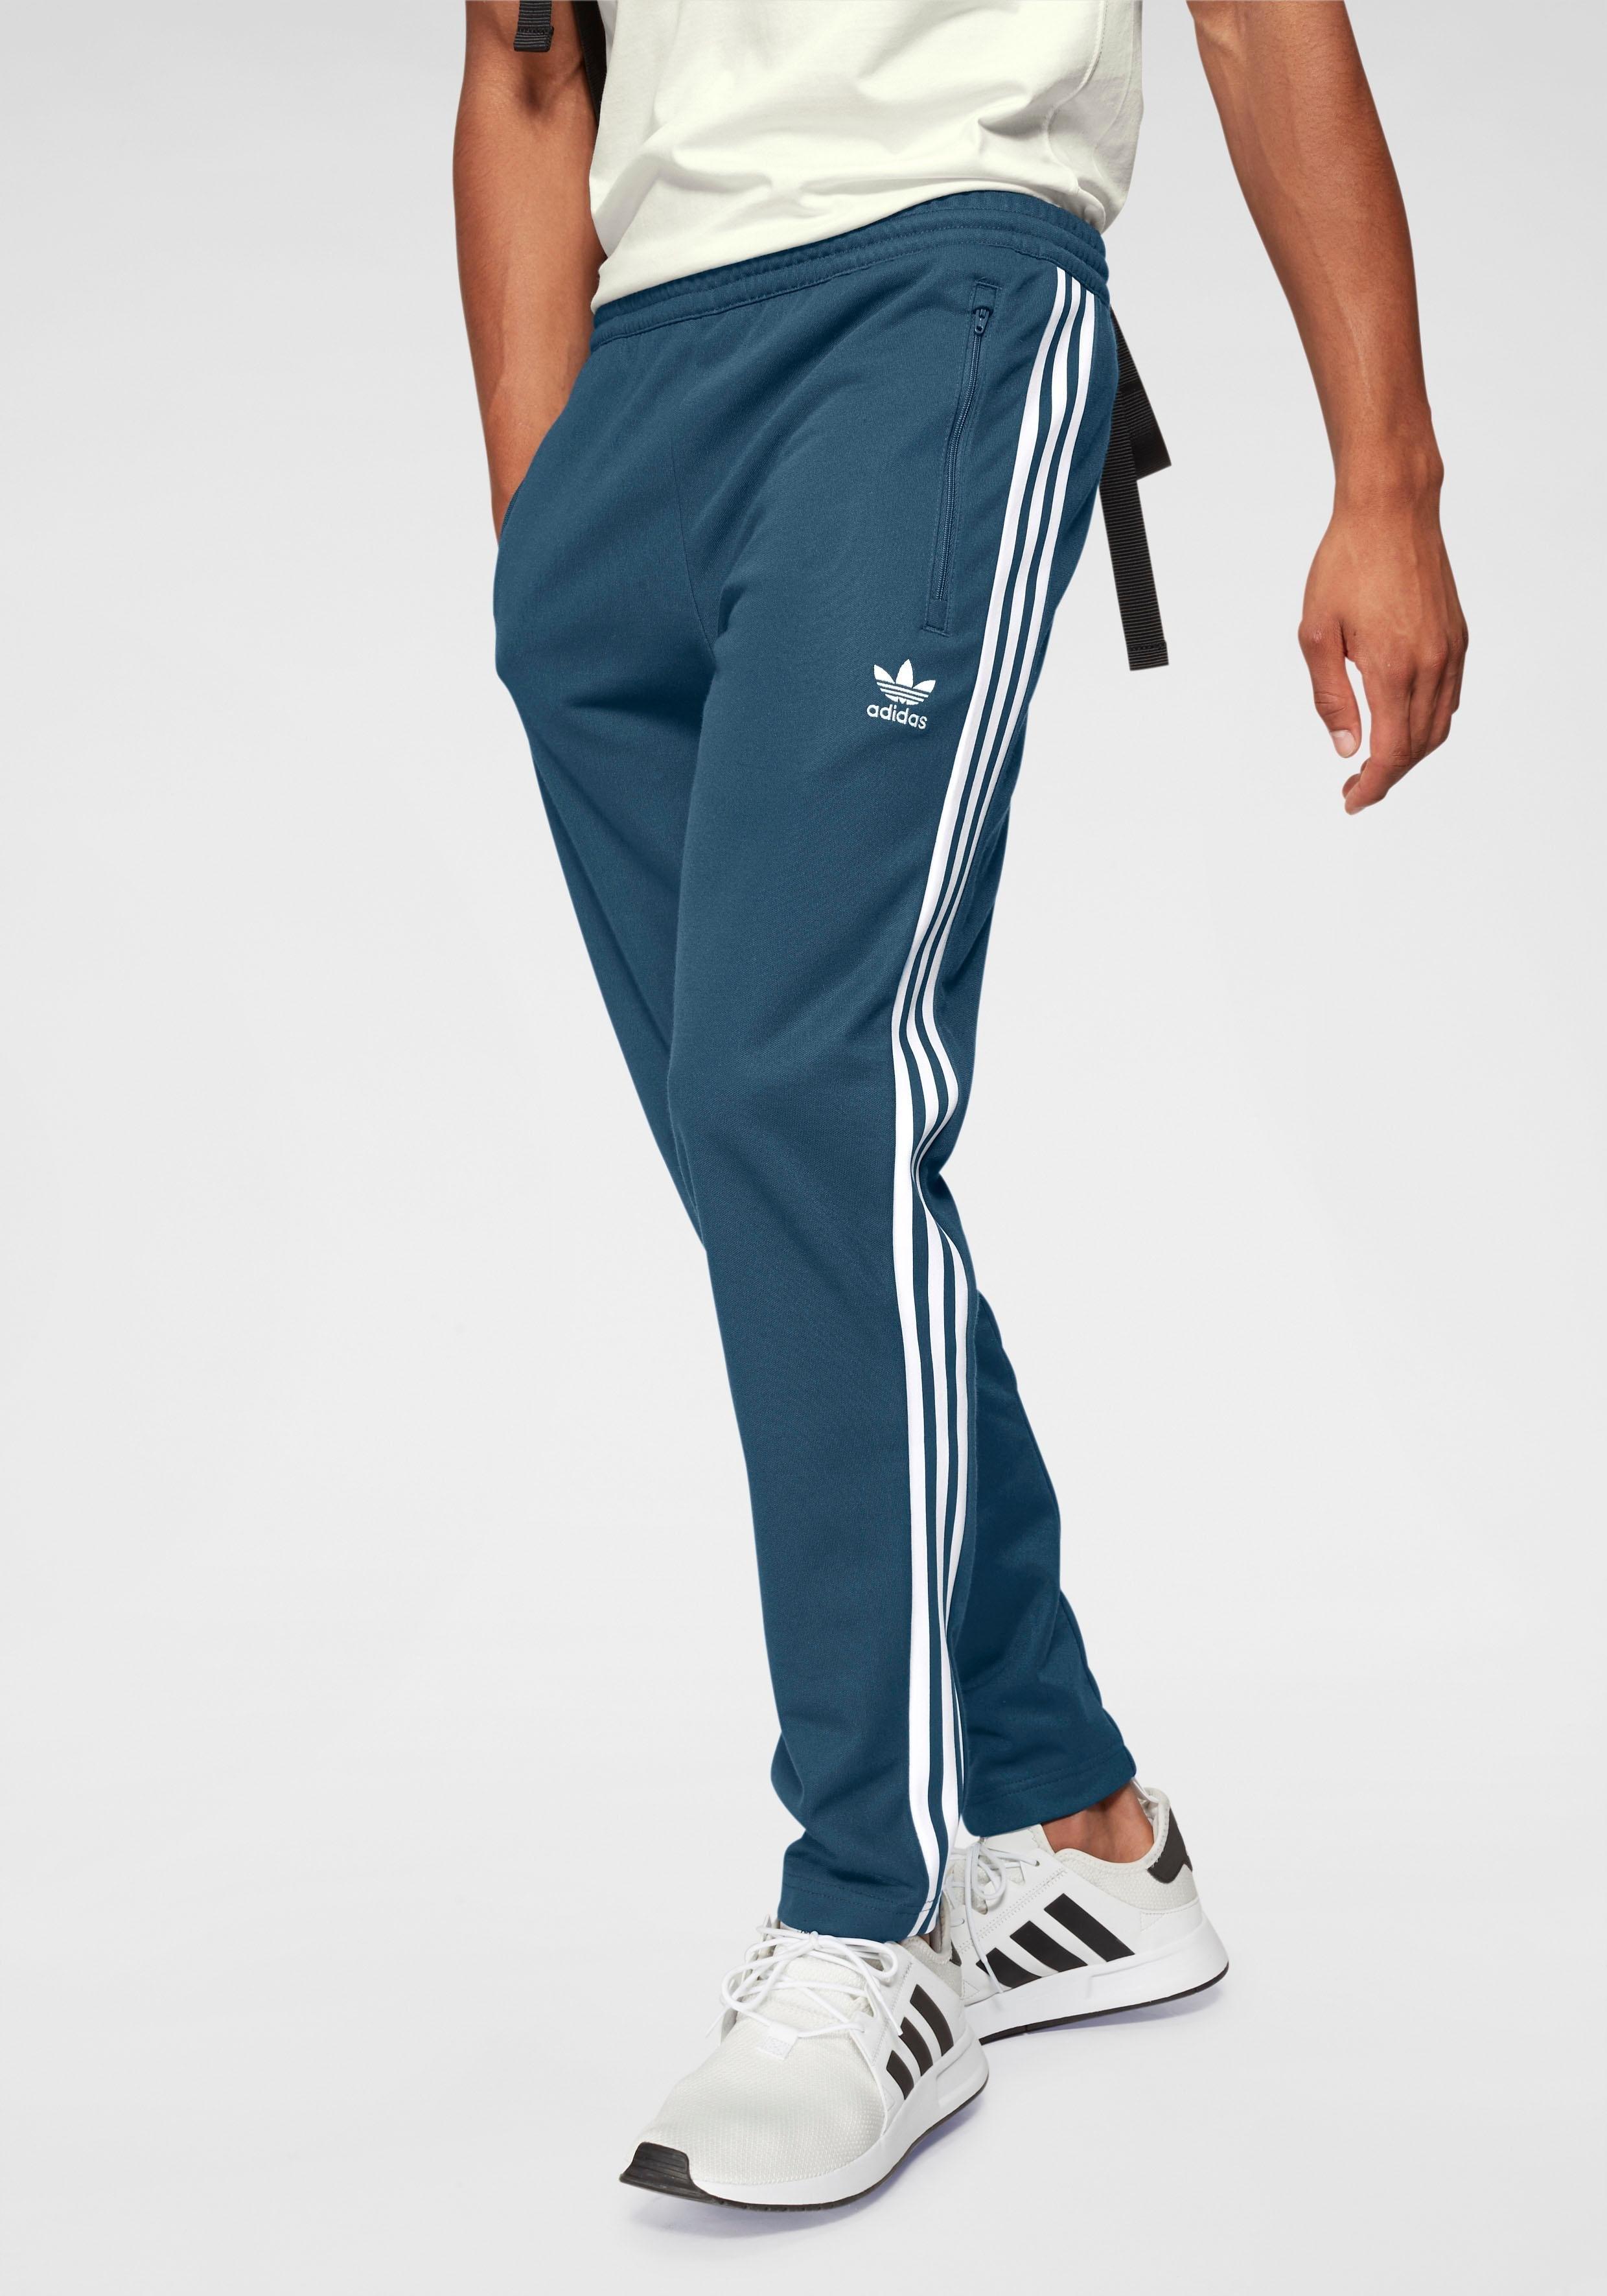 4b619b6f389 Afbeeldingsbron: adidas Originals trainingsbroek »FRANZ BECKENBAUER  TRACKPANTS«